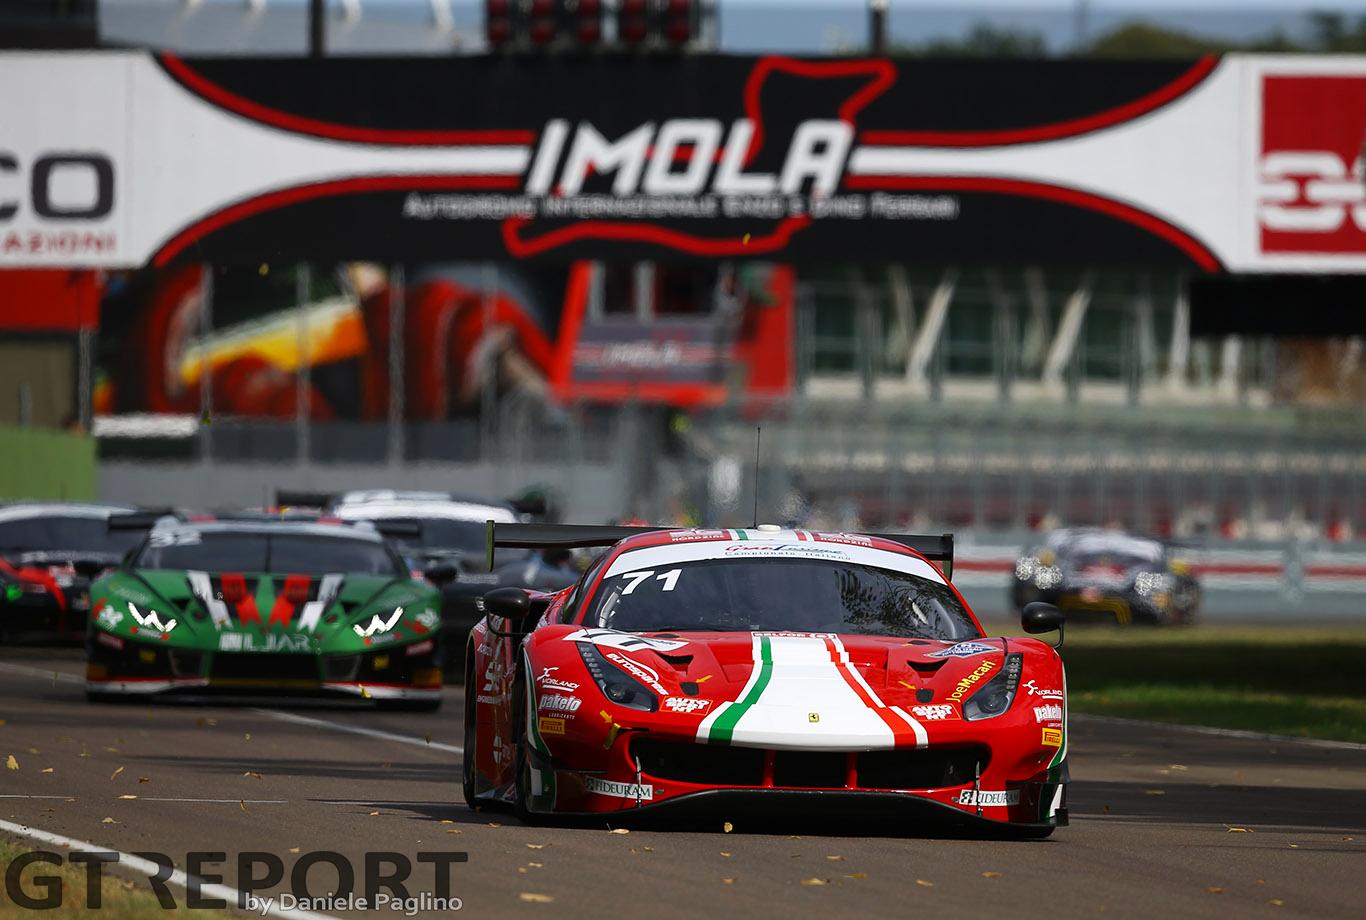 2021 Italian GT calendar presented: Enna-Pergusa returns